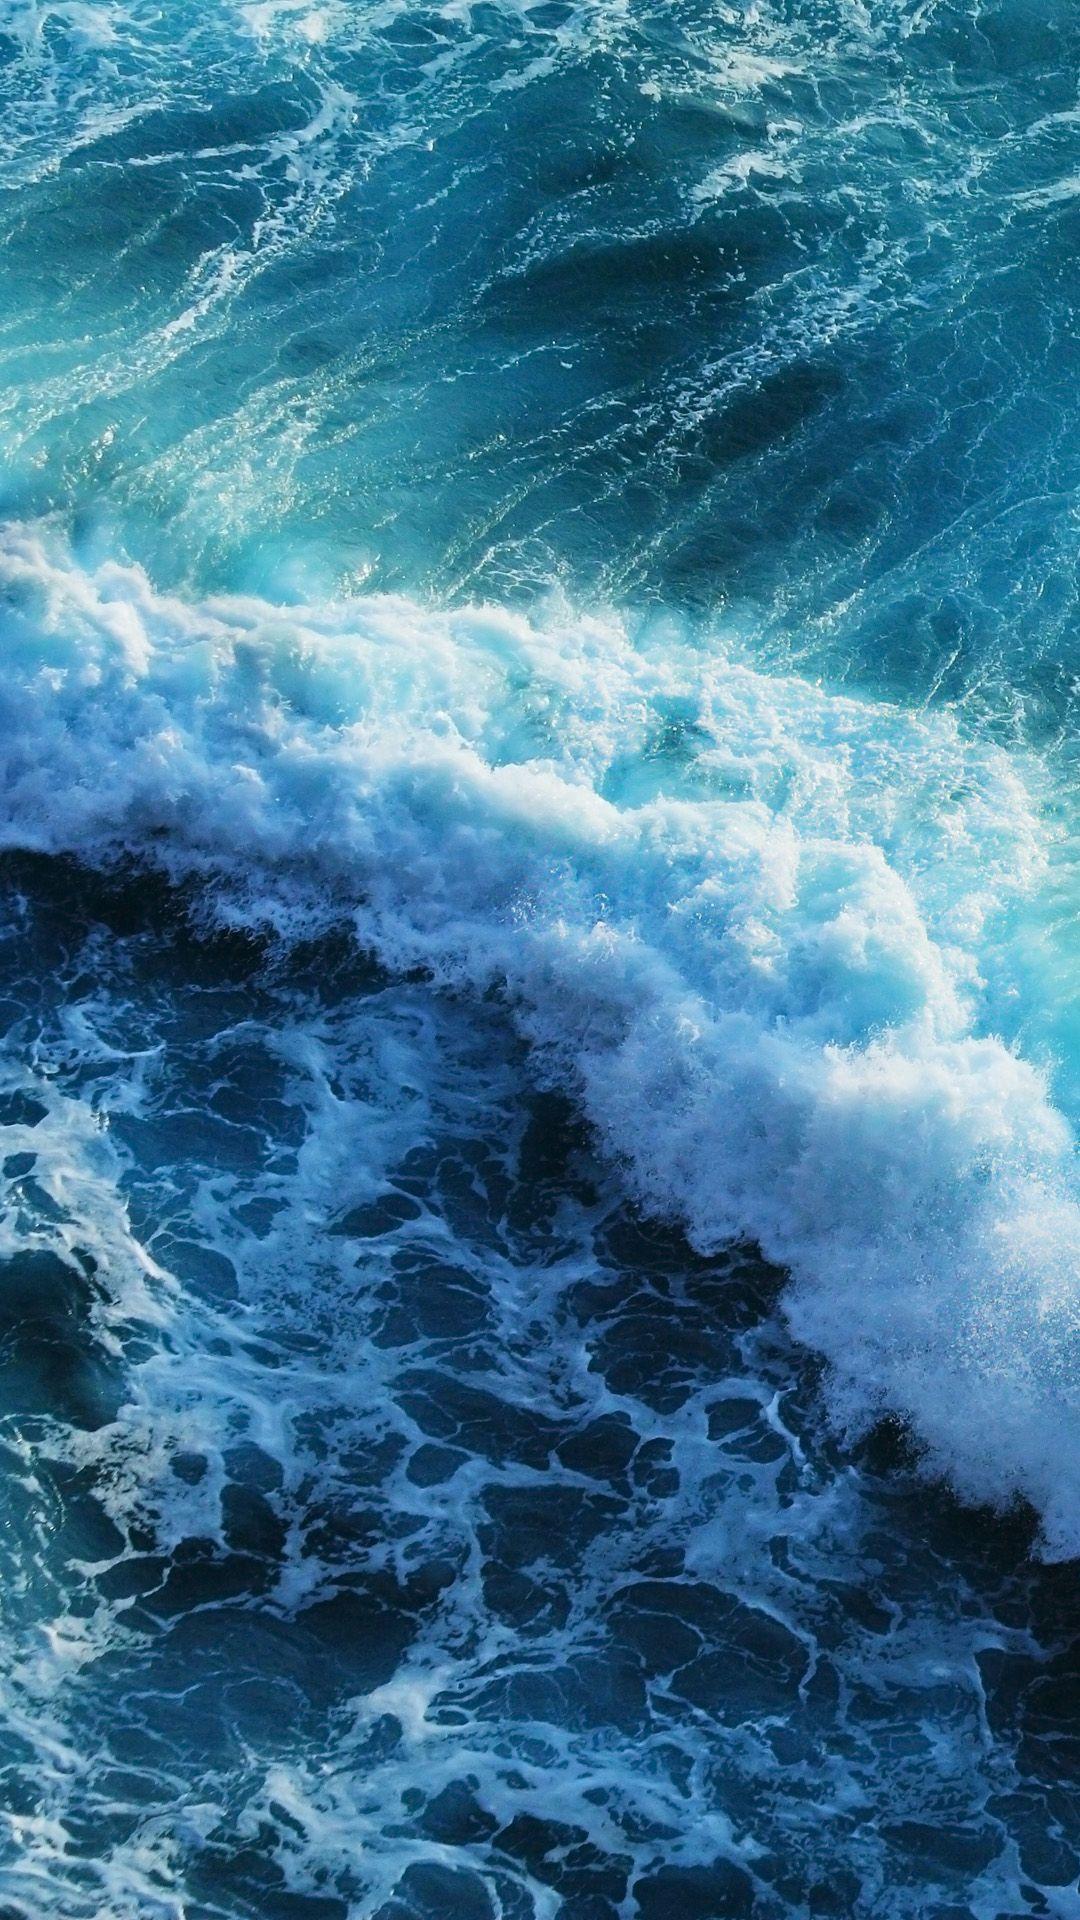 27 Waves Wallpapers On Wallpapersafari